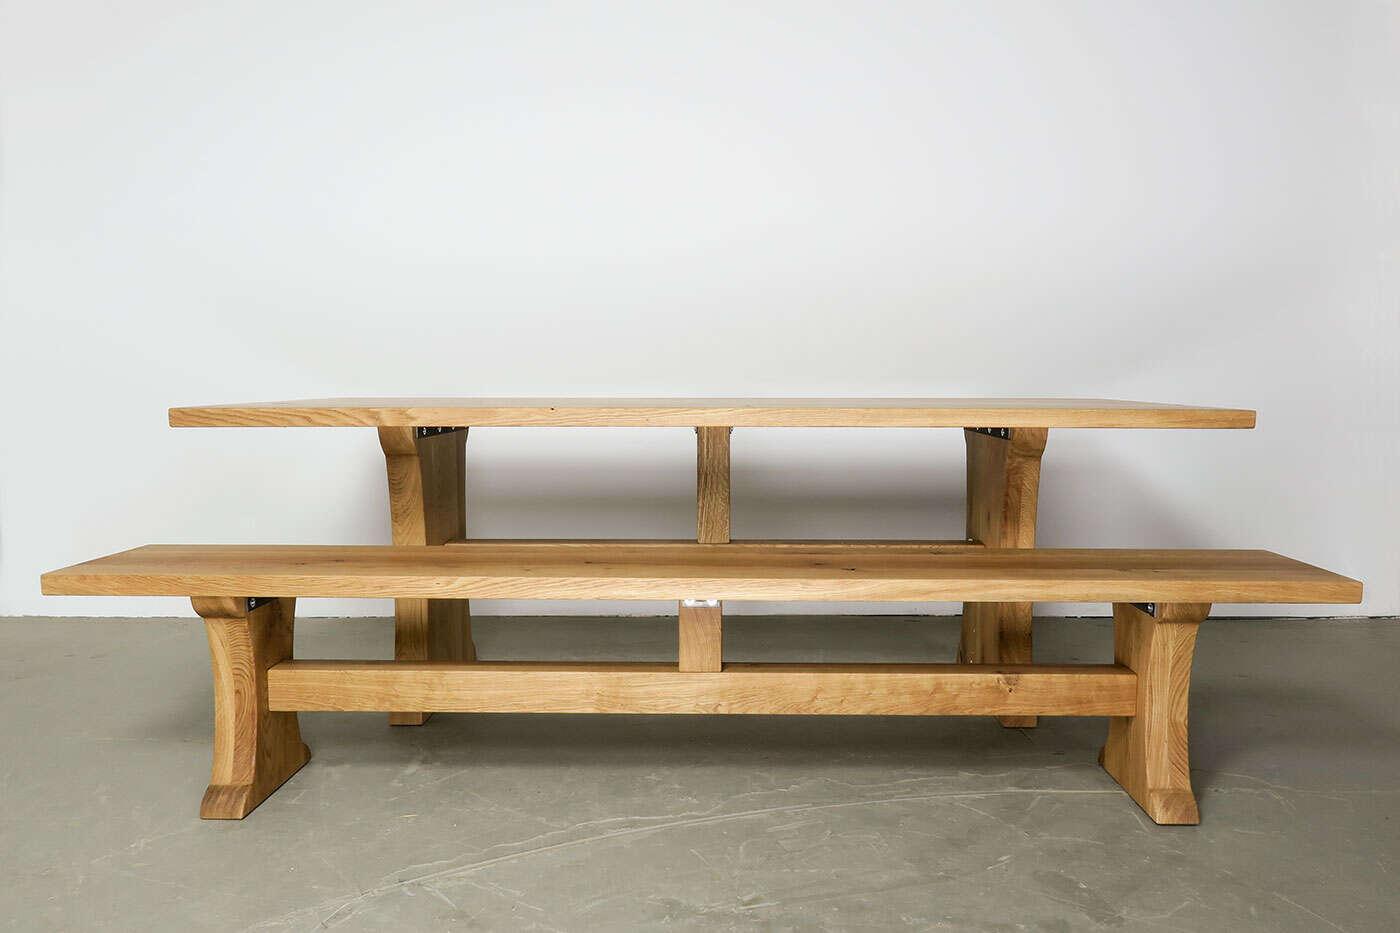 toskana sitzbank eiche massiv nach ma. Black Bedroom Furniture Sets. Home Design Ideas